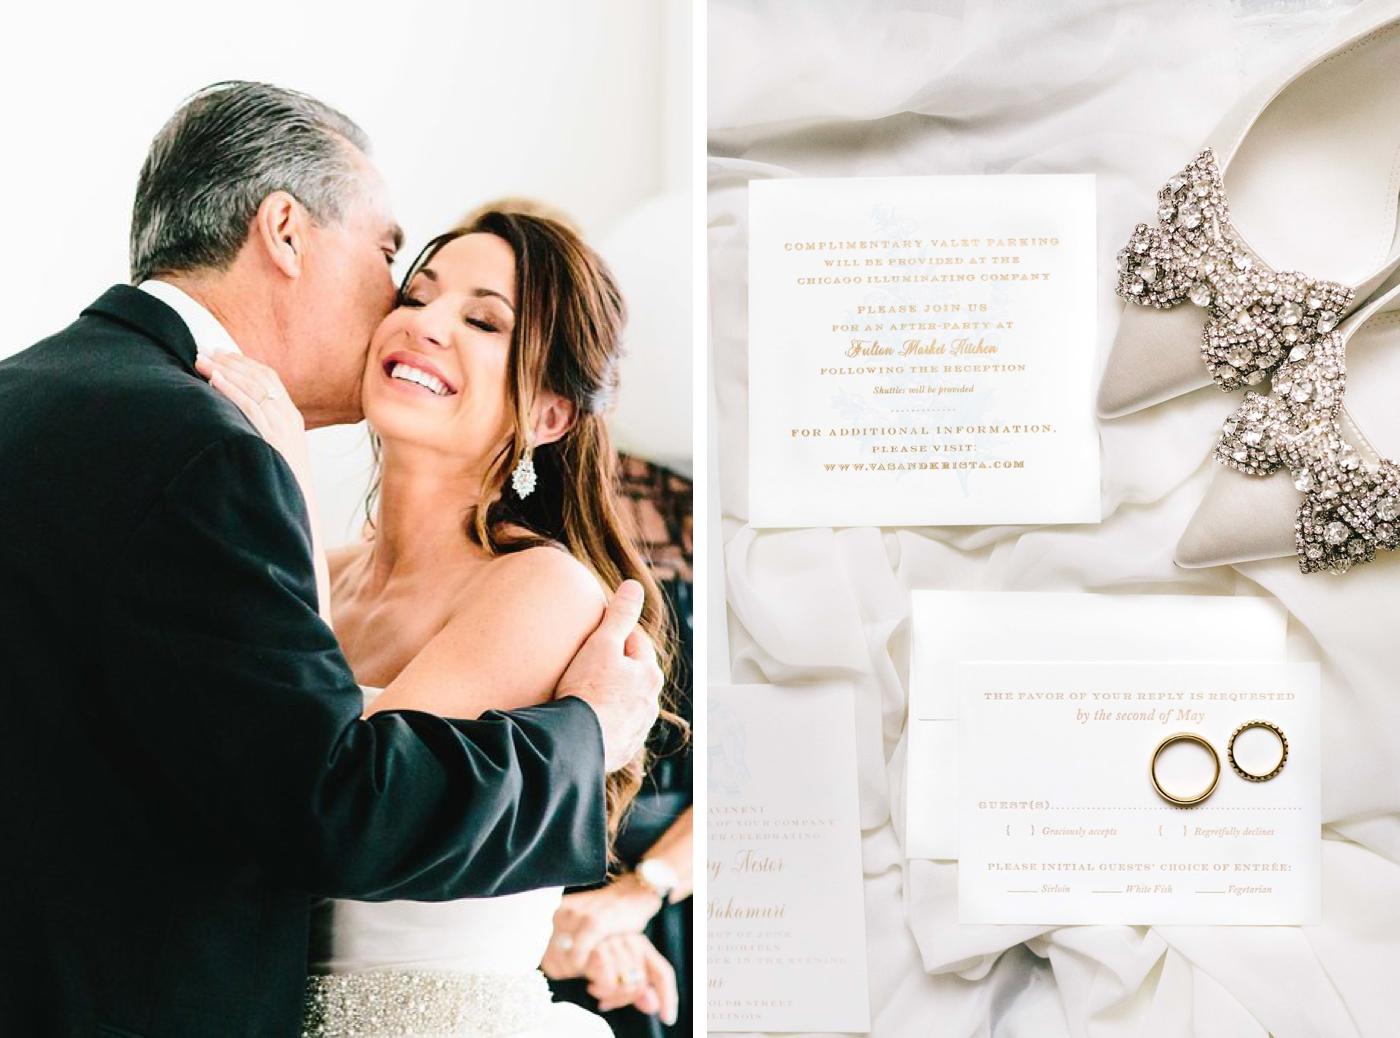 chicago-fine-art-wedding-photography-sakamuri11